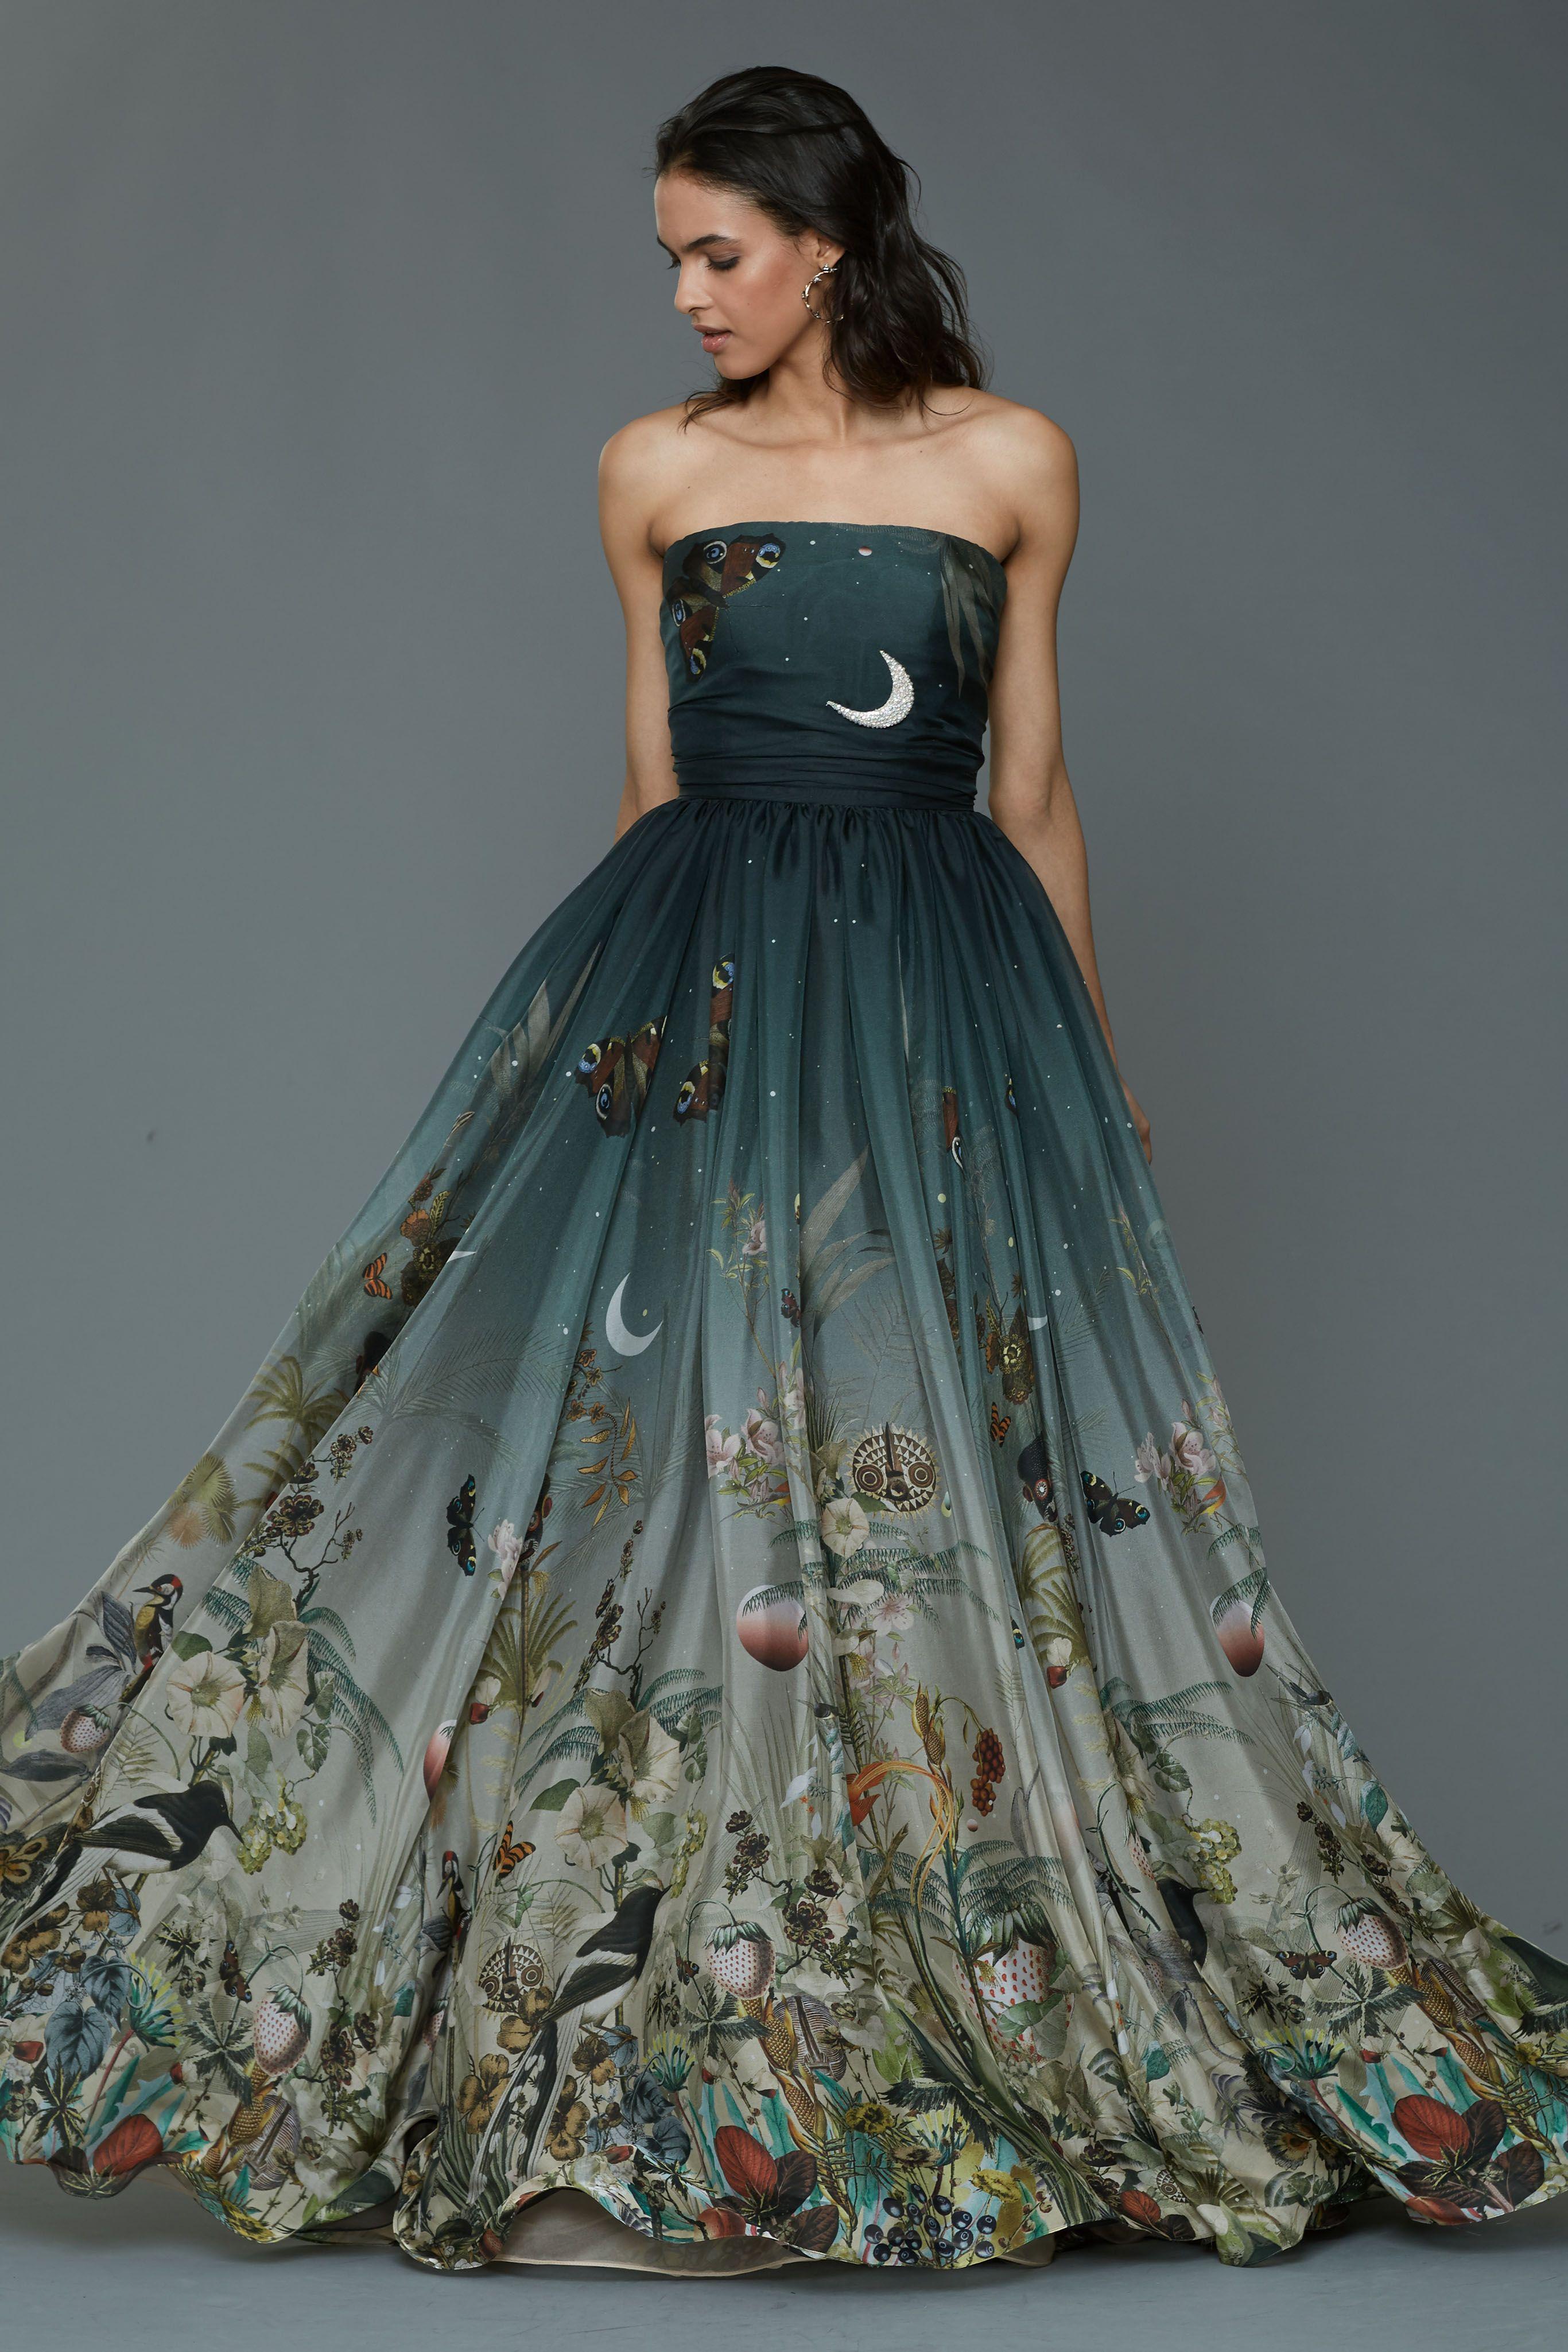 dennis basso | gowns, gorgeous gowns, fancy dresses